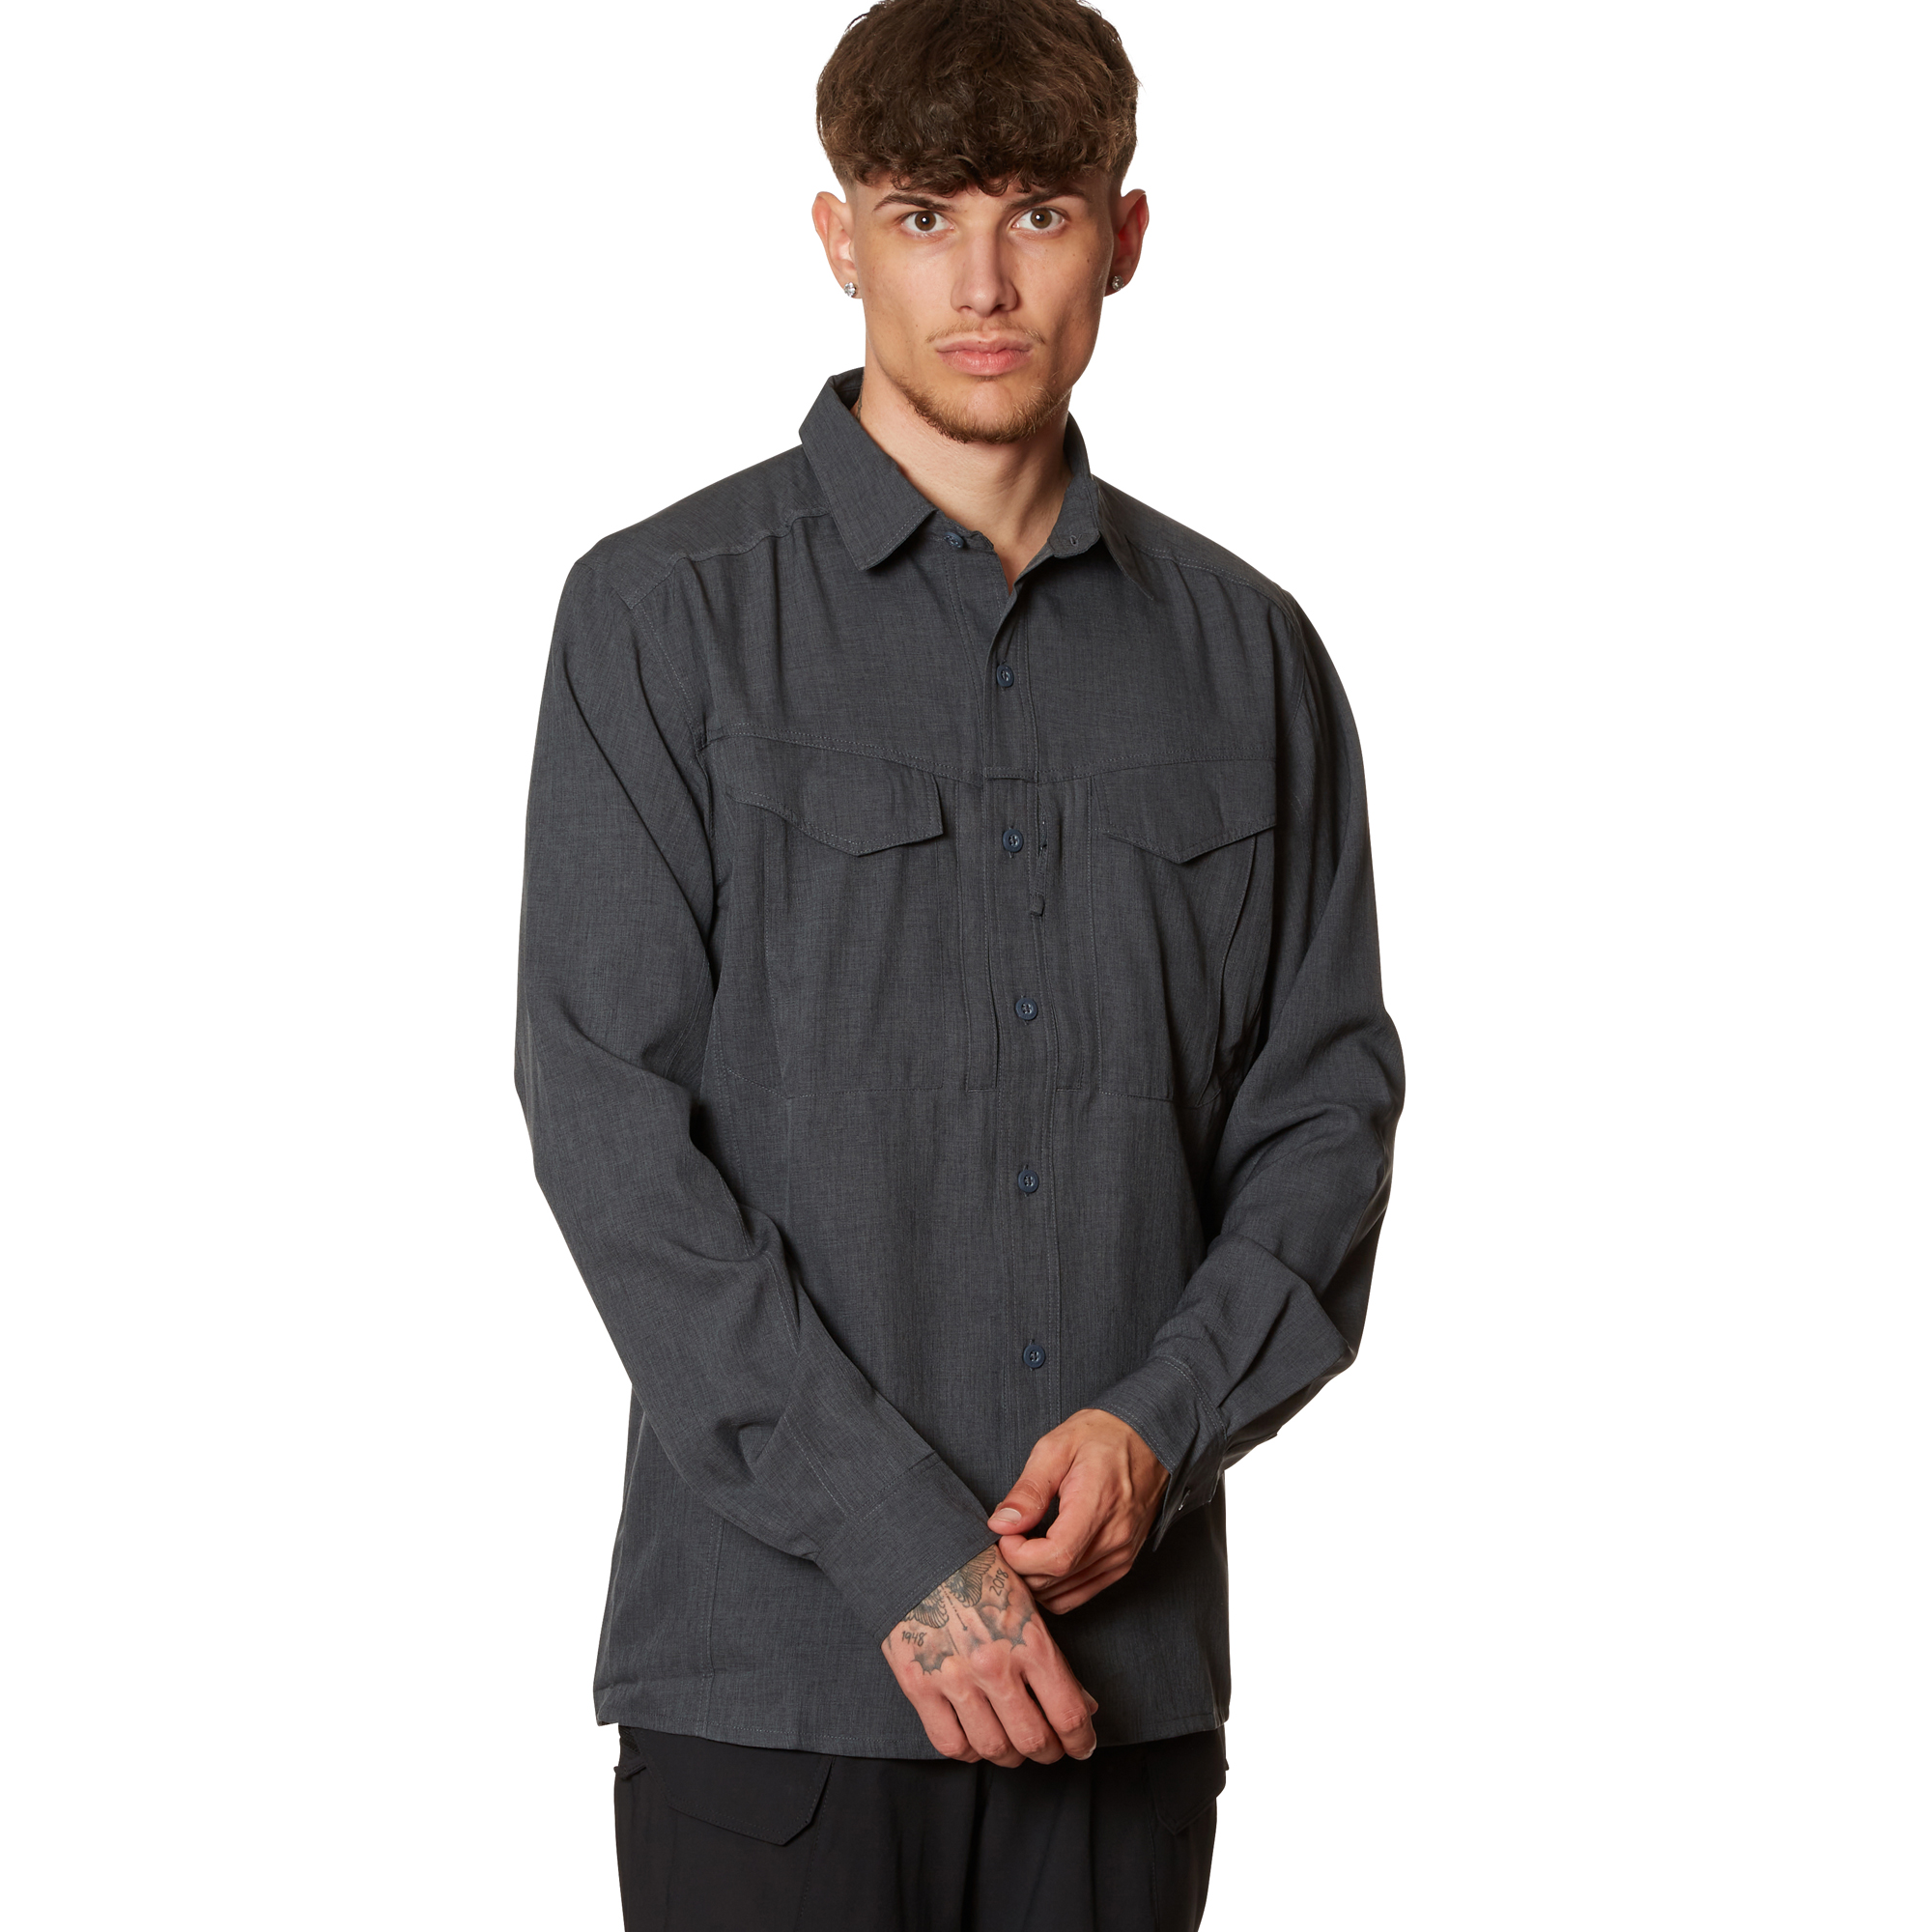 Helikon-Tex Chemise Defender MK2 Gentleman Shirt melange black g